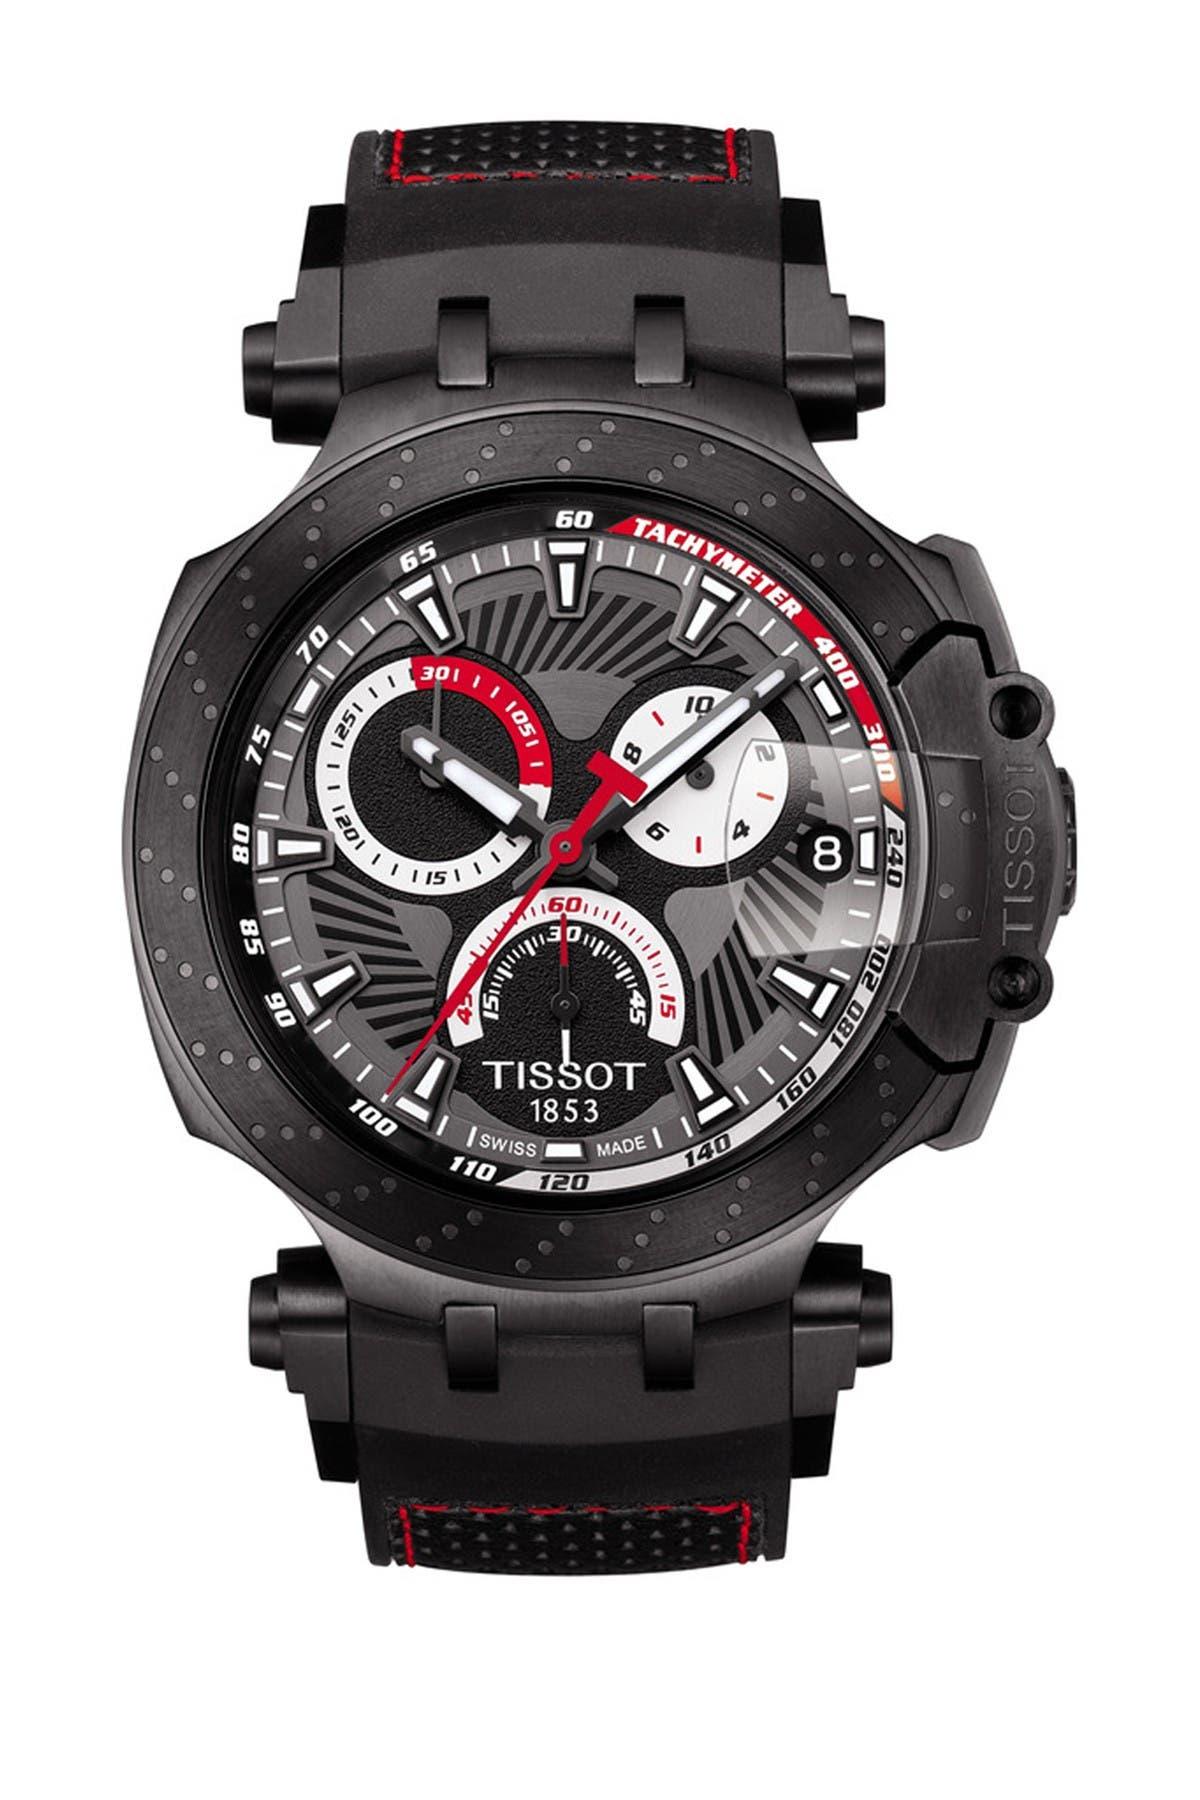 Image of Tissot Men's T-Race Jorge Lorenzo 2018 Limited Edition Swiss Watch, 47mm